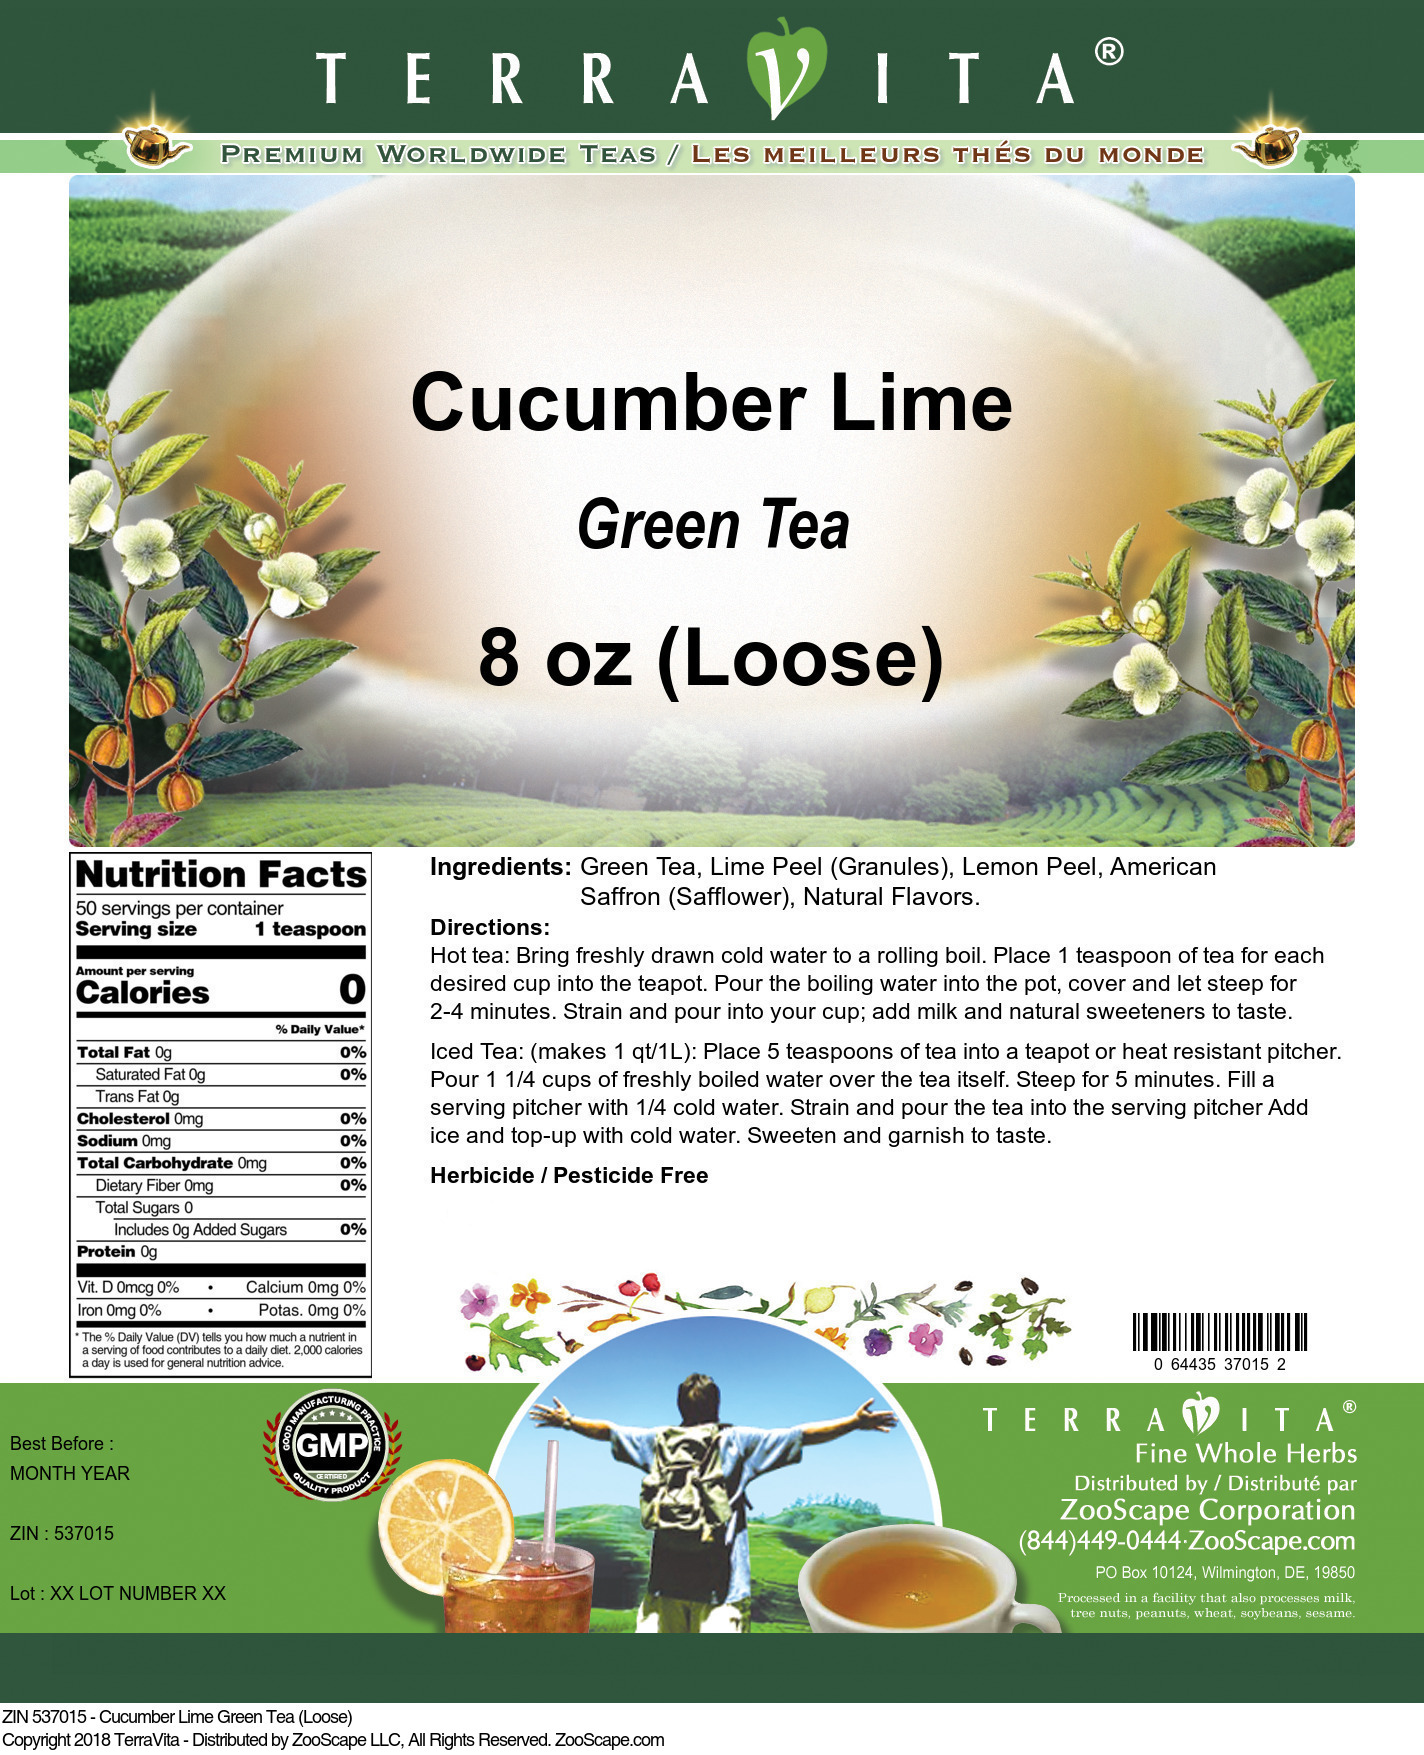 Cucumber Lime Green Tea (Loose)